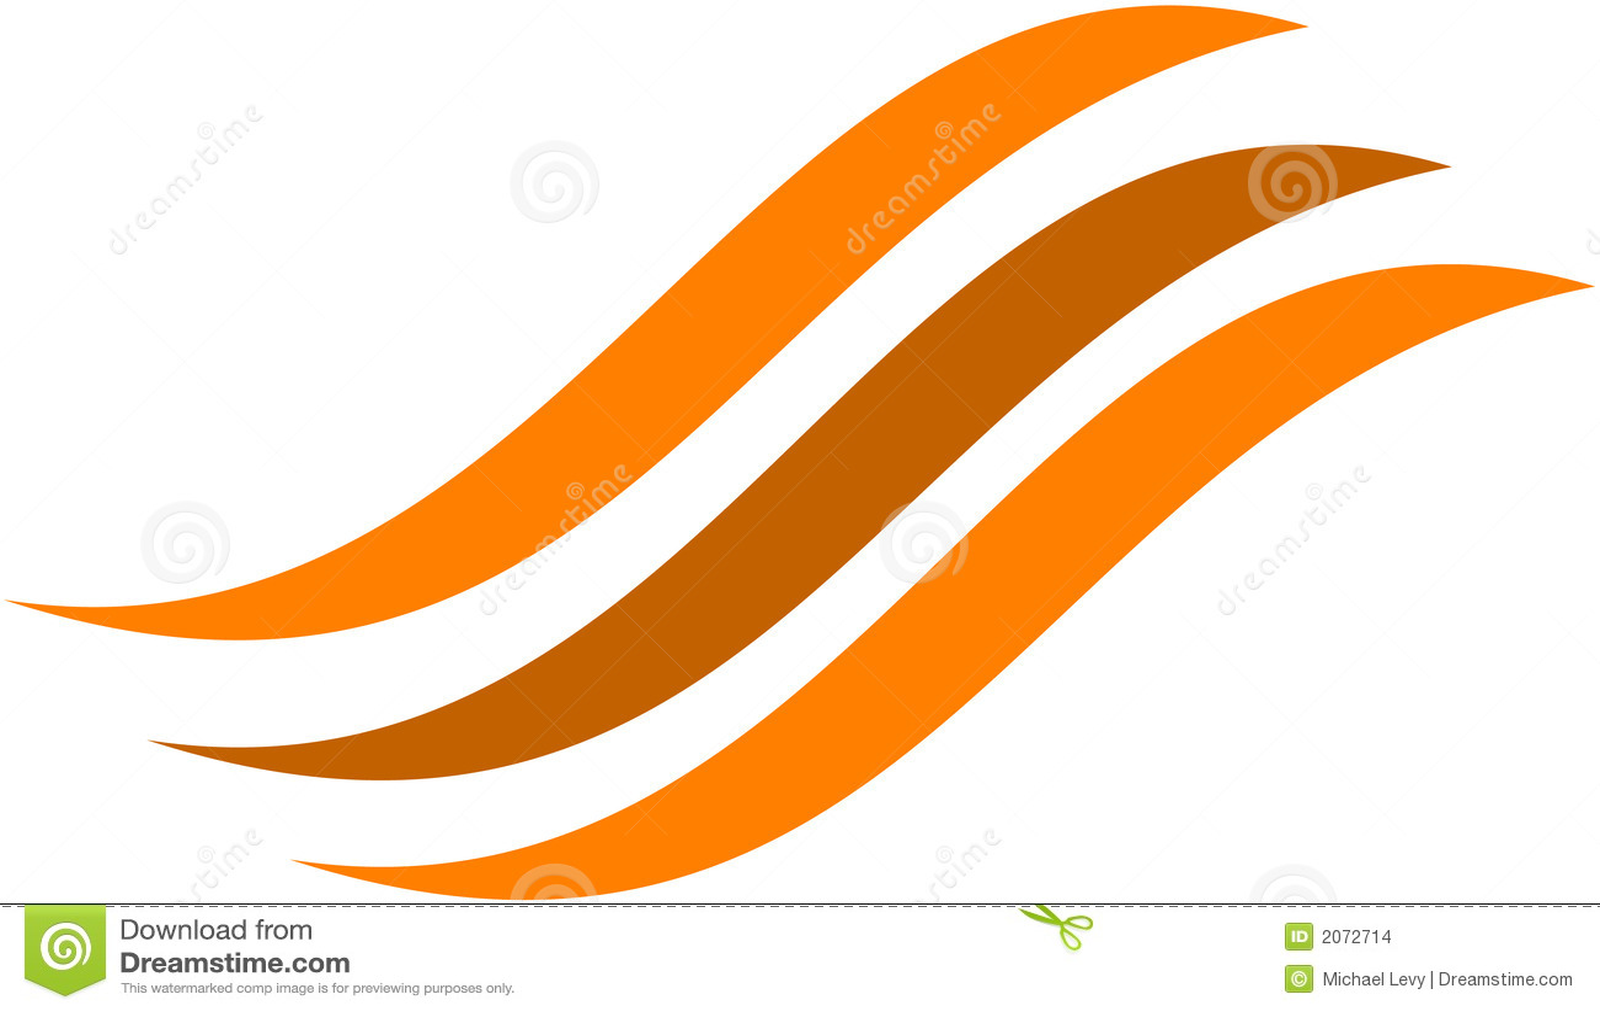 Energy Symbol Stock Images - Image: 2072714